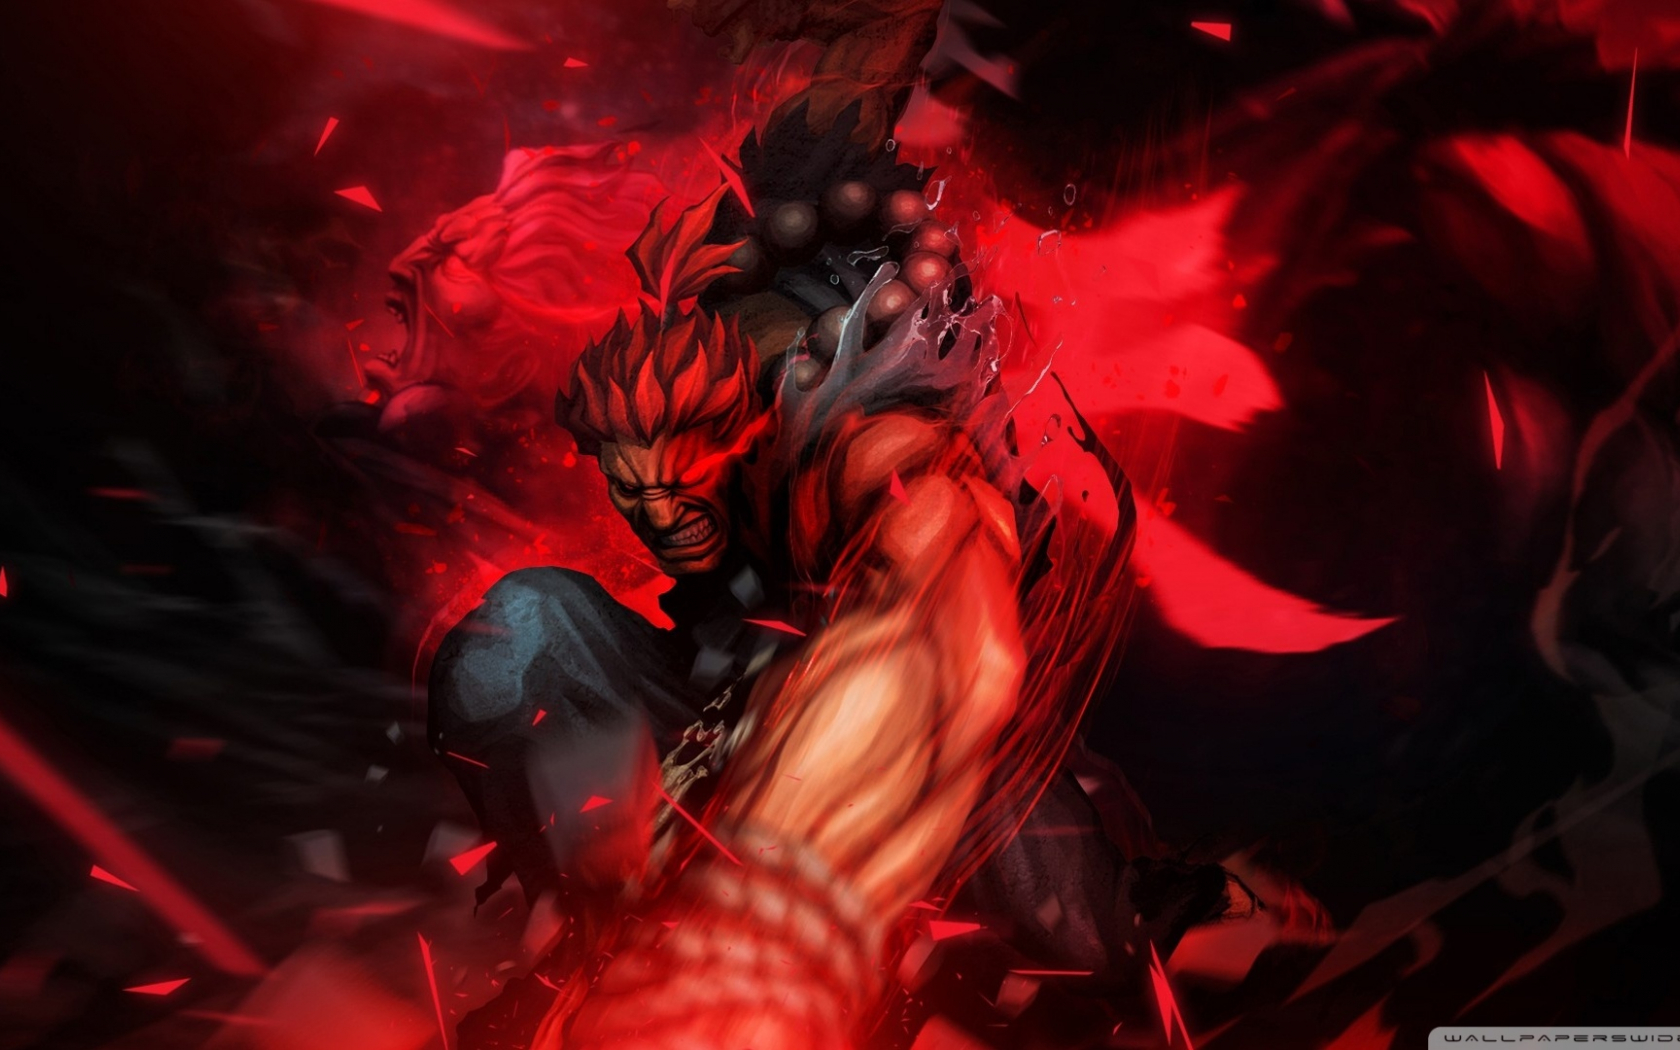 Free Download Tekken Akuma Street Fighter Wallpaper 1920x1080 Full